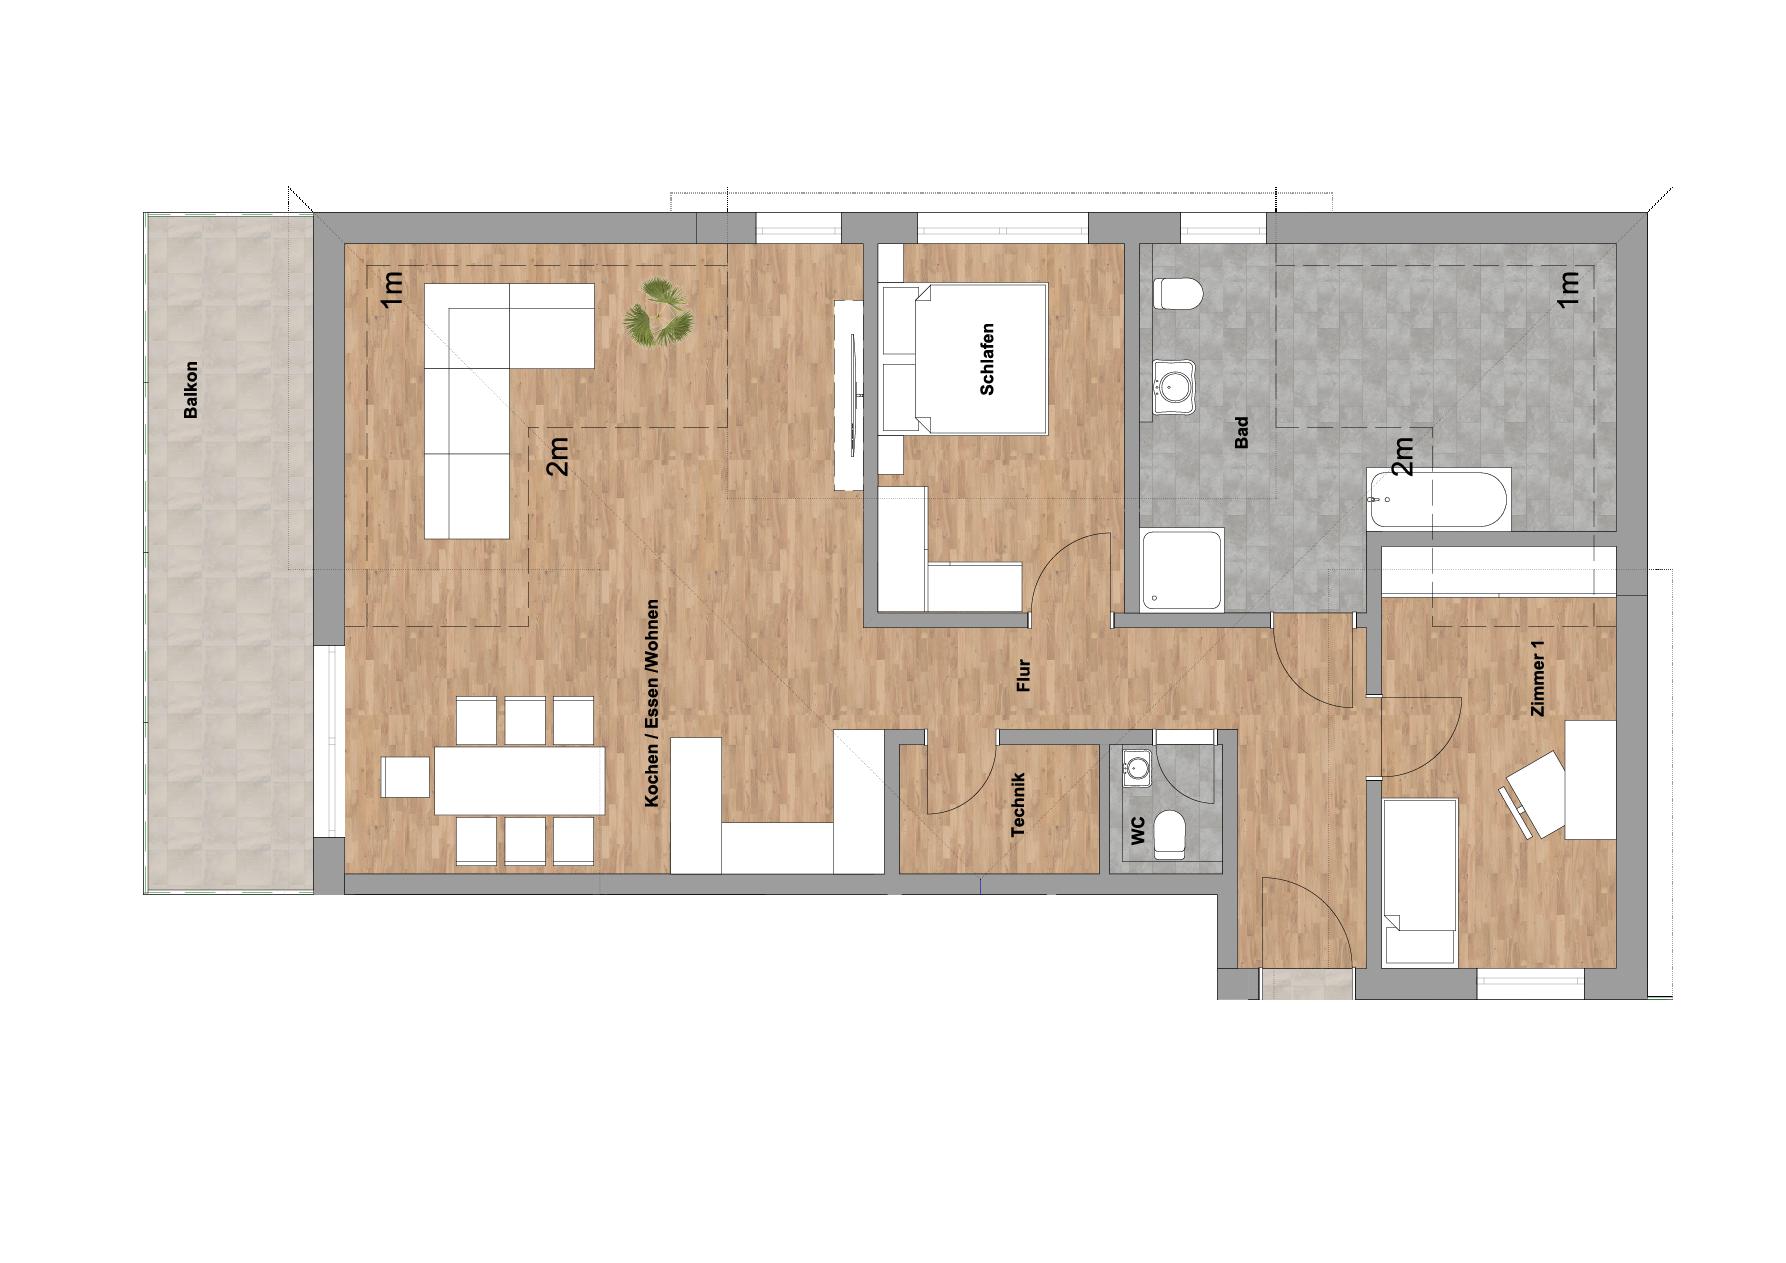 infoScout Neubau Projekt Ittersbach Wohnung 12